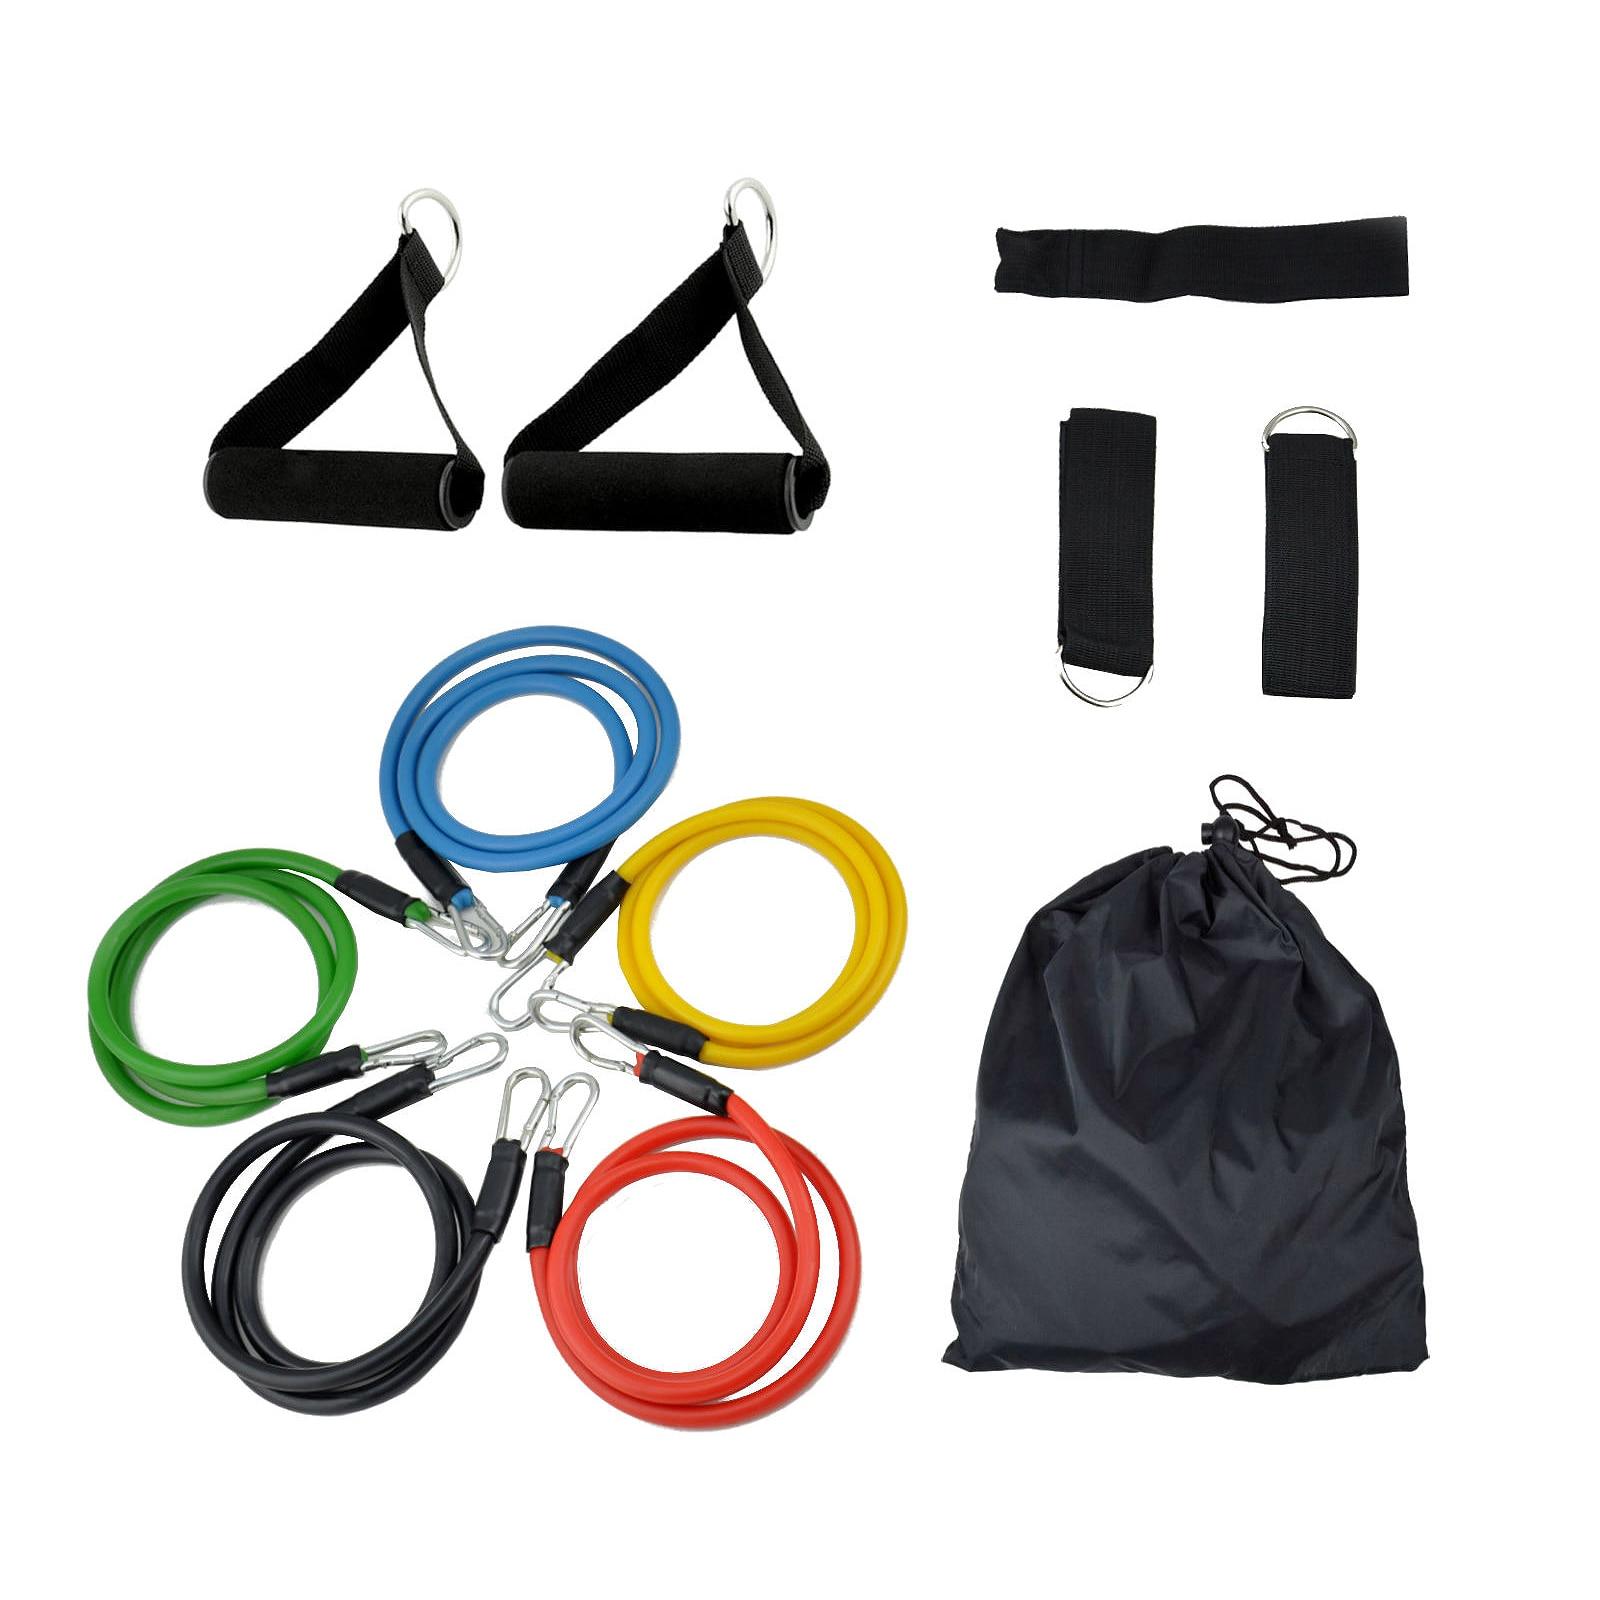 Bande Di Resistenza Set Per Yoga Abs Pilates Fitness Exercise Workout 11 Pezzi E La Digestione Aiuta